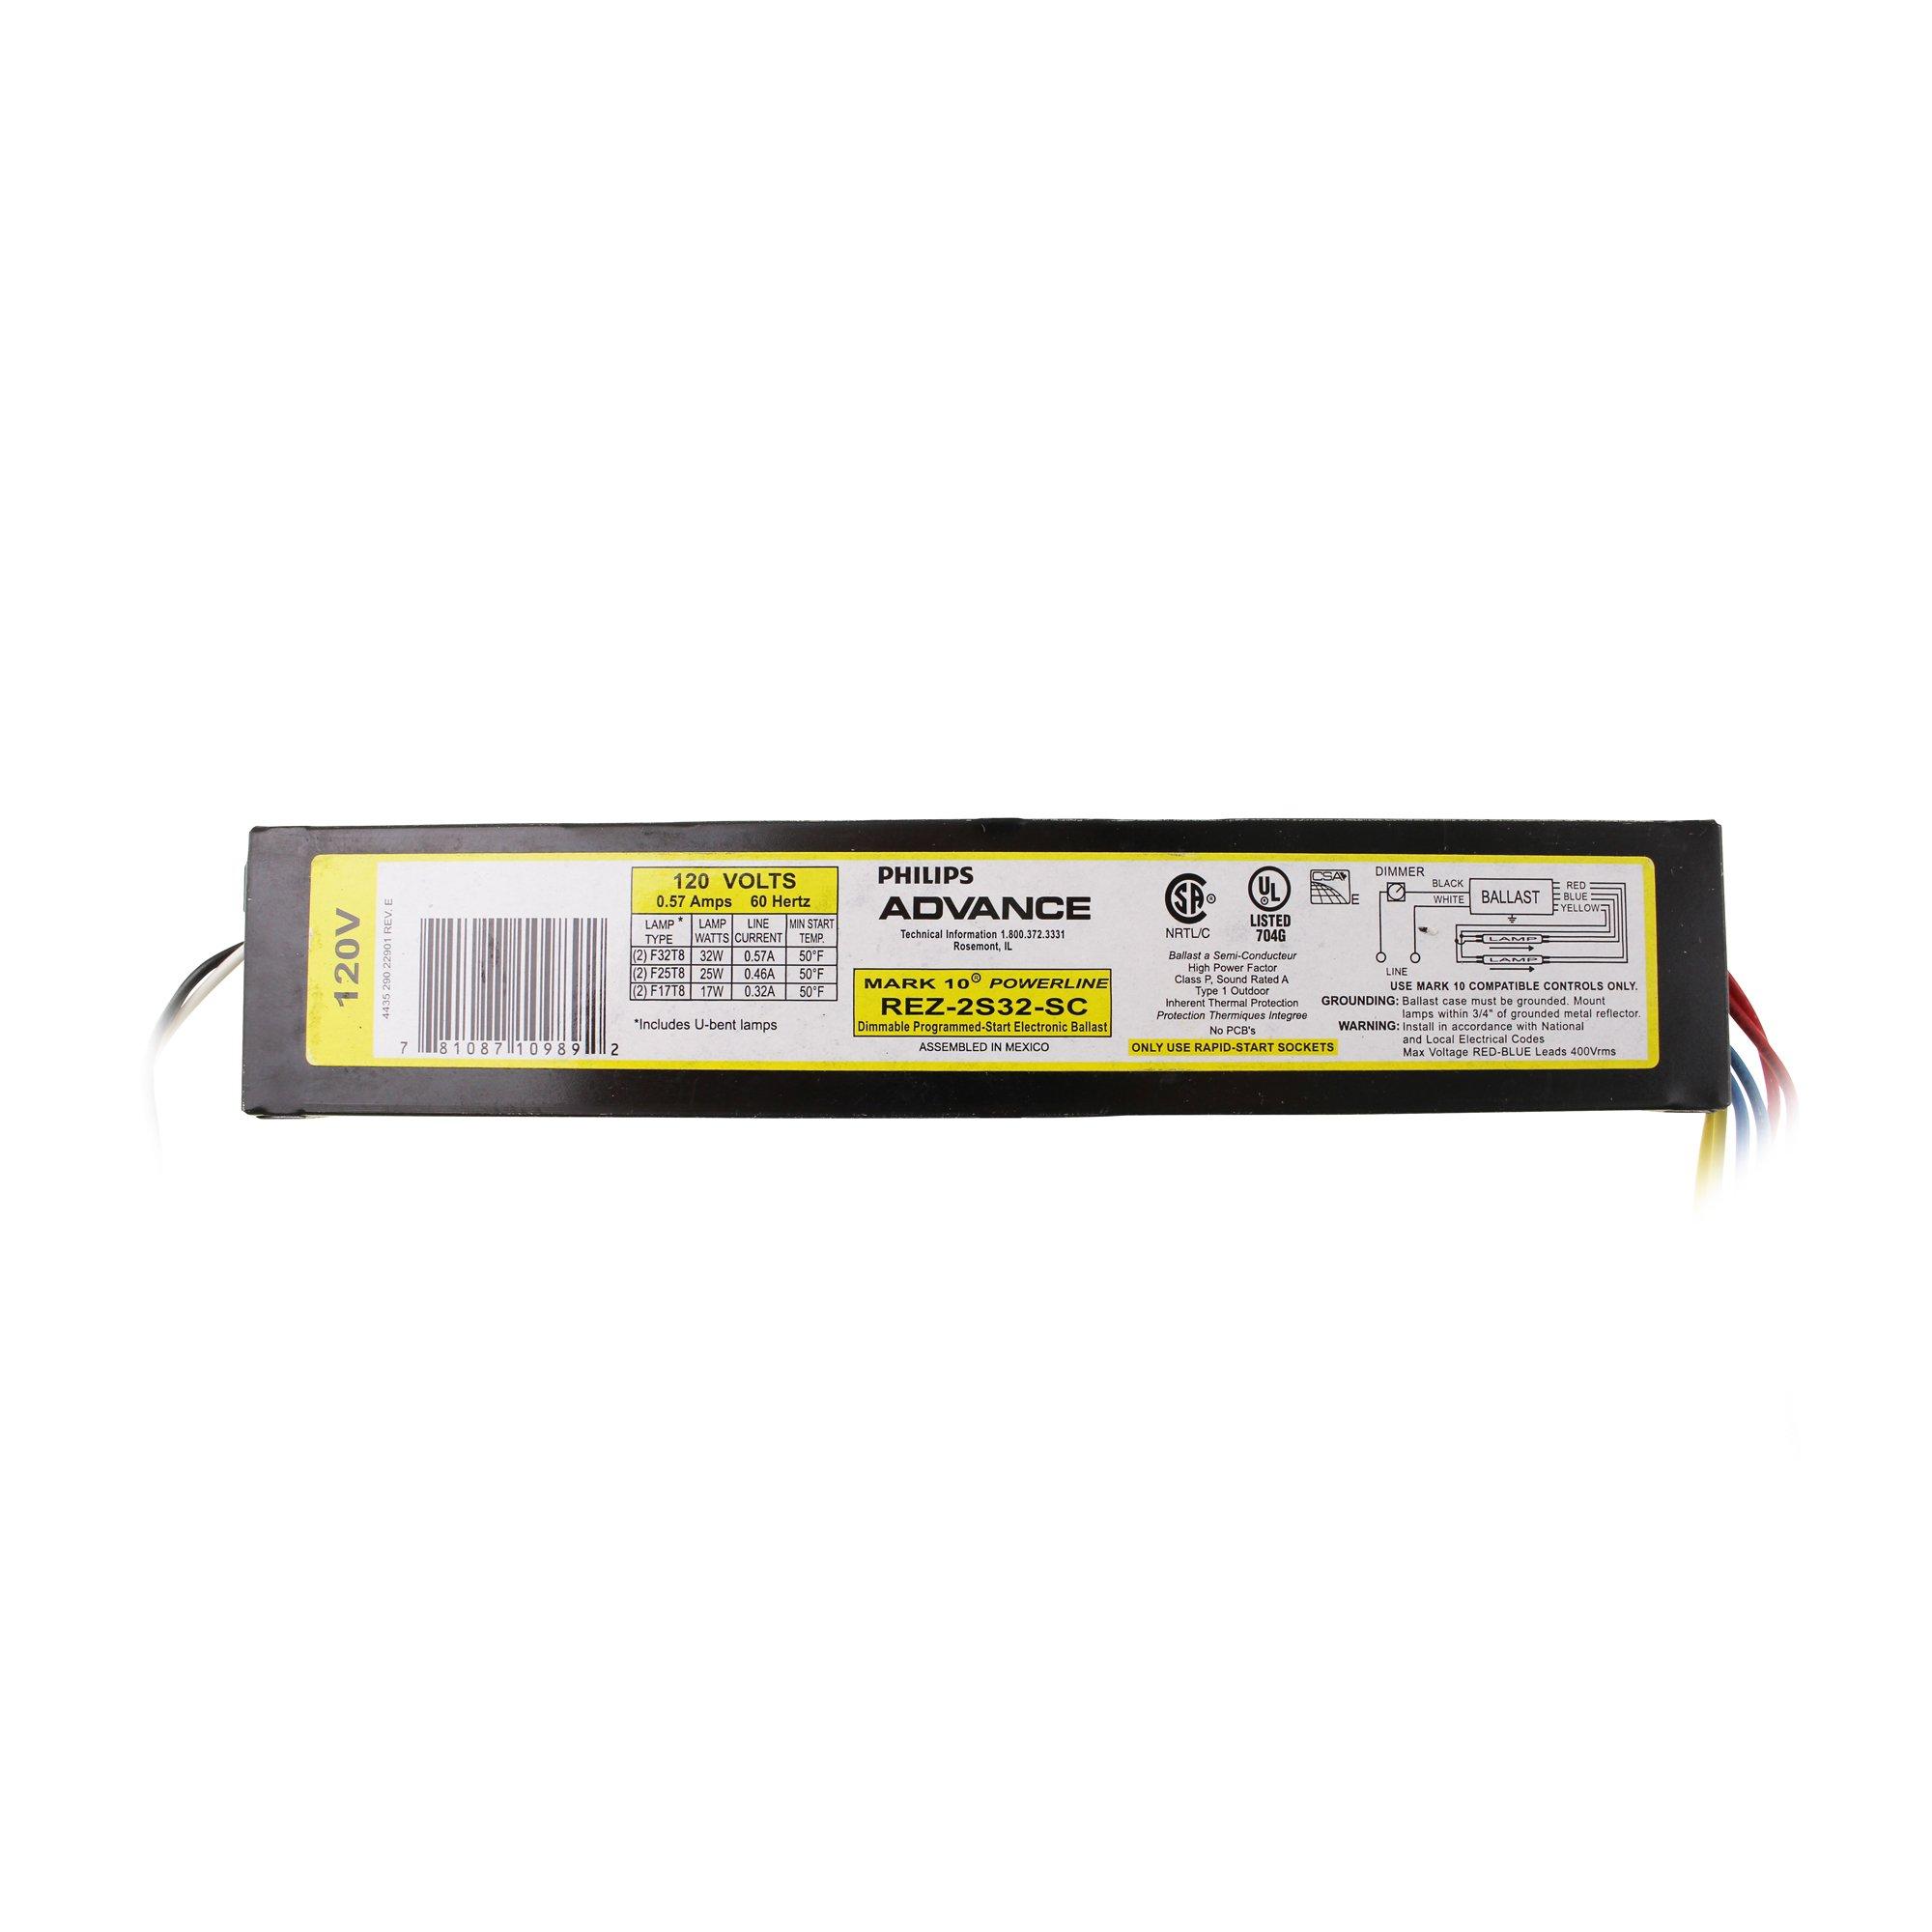 Philips Advance REZ2S32SC35I (2) 32 Watt F32T8 Lamp Dimmable Fluorescent Ballast 120 Volt Mark 10 Powerline